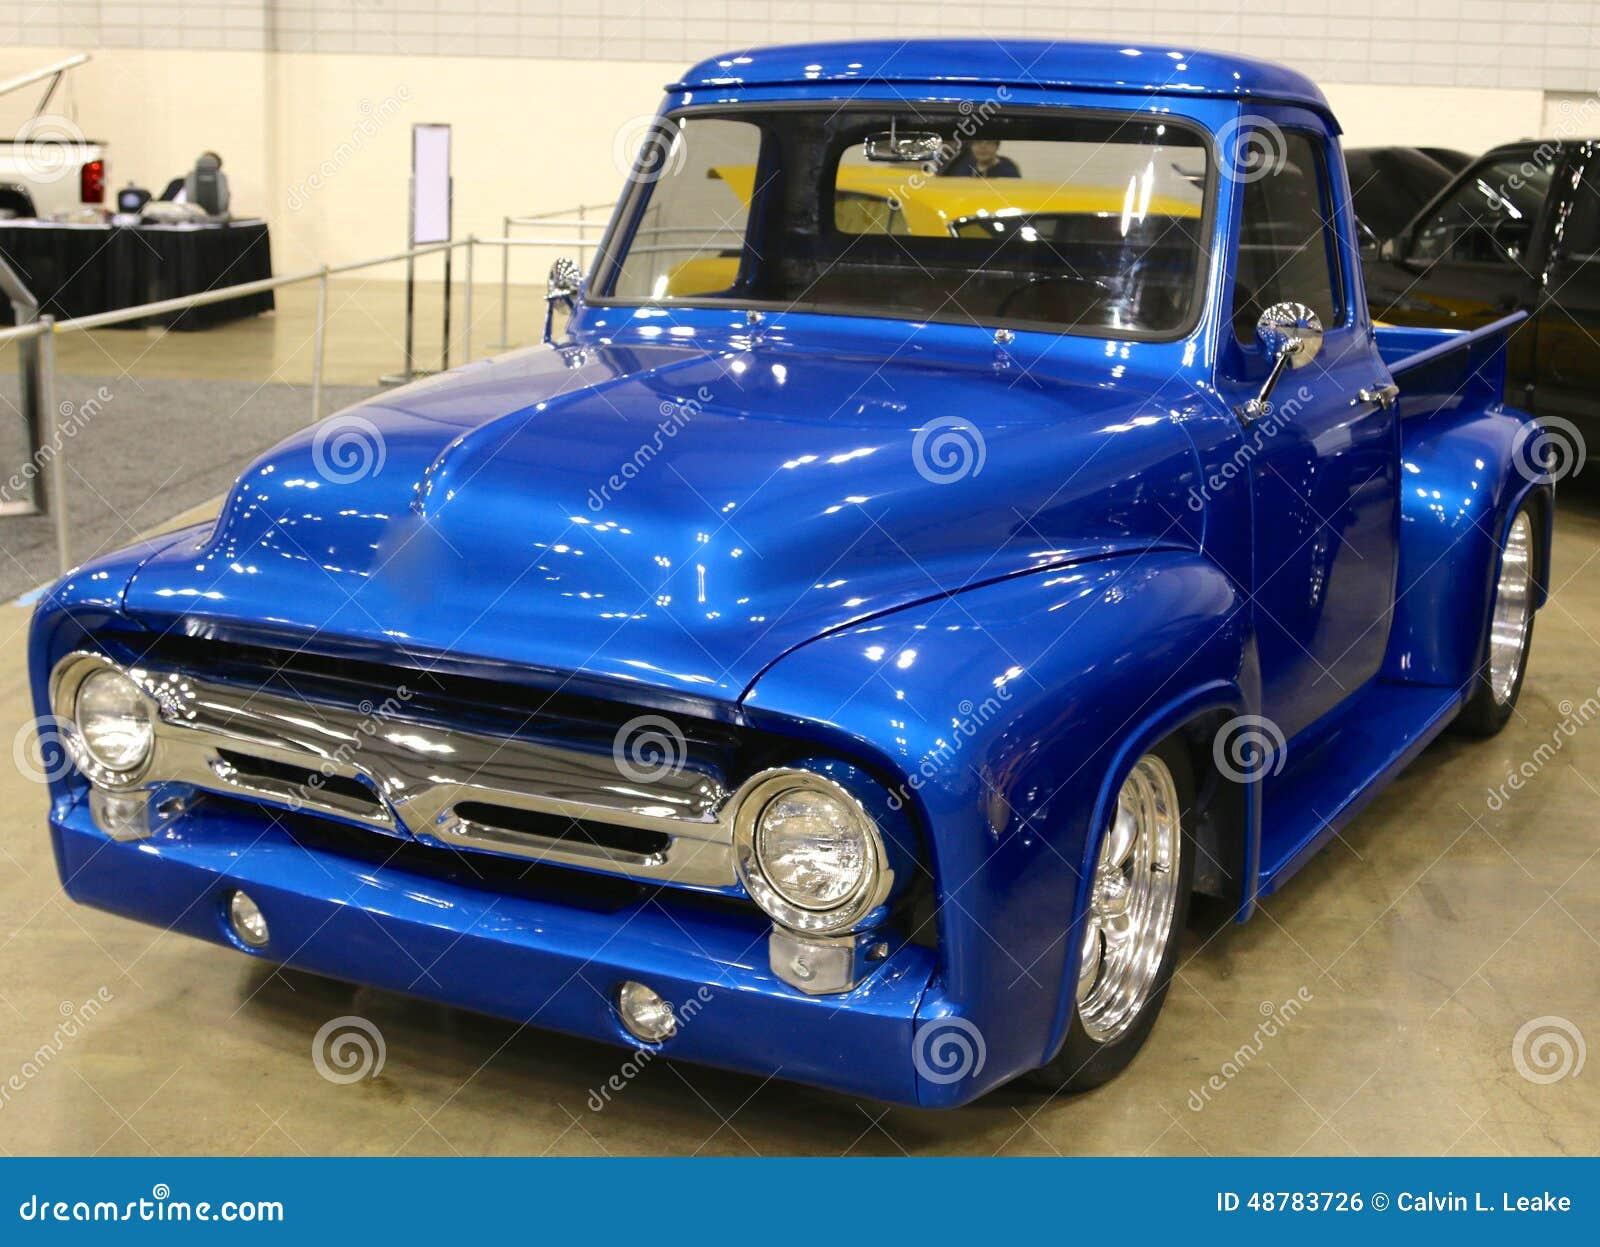 400 ford engine rebuild kit  400  free engine image for